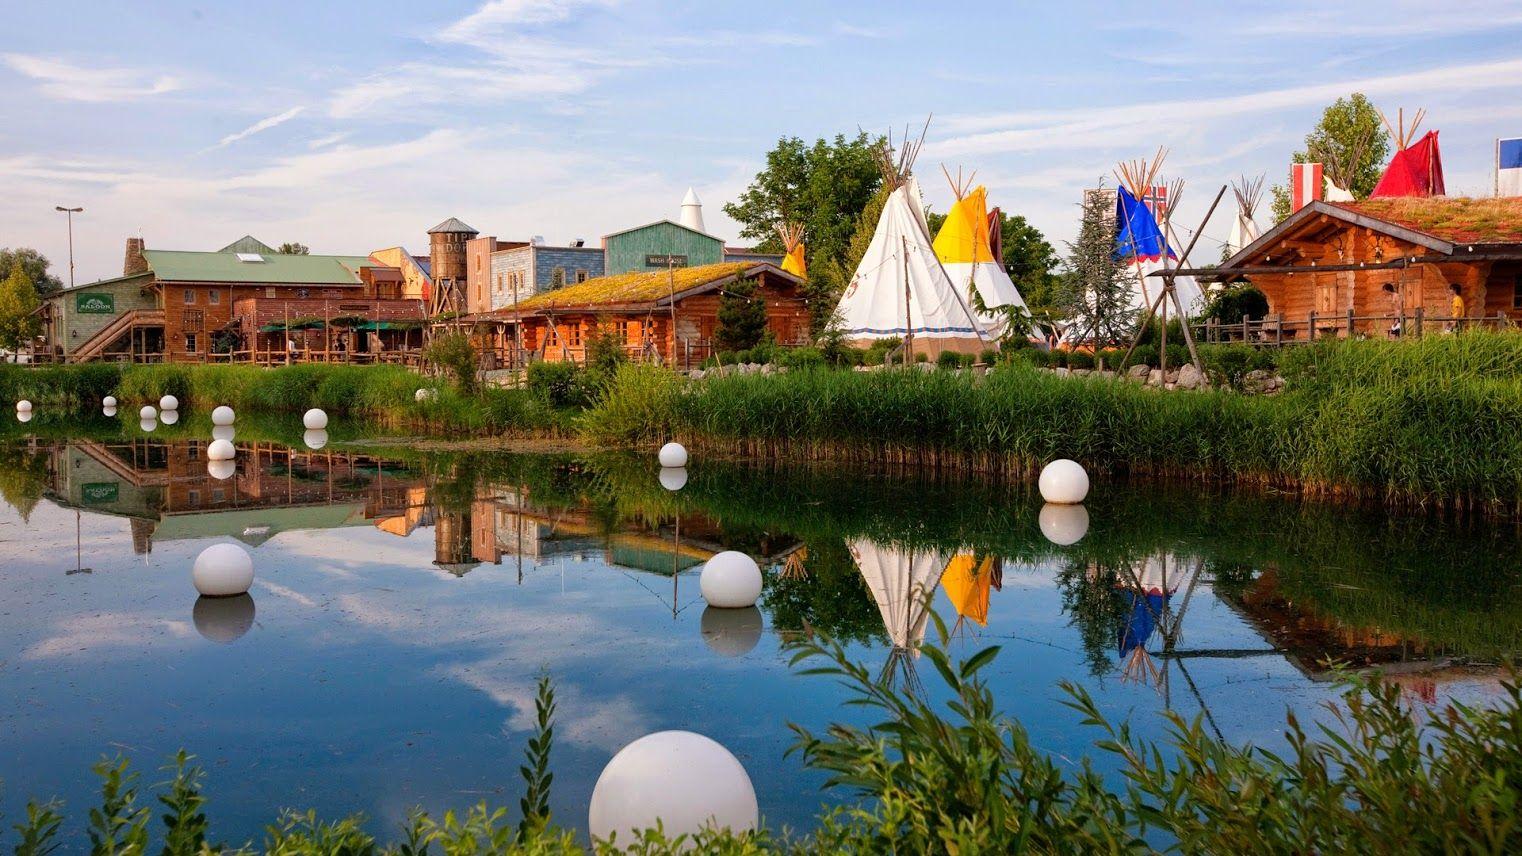 Europa Park Camp Resort In Rust Baden Wurttemberg Rheinweg 5 Europa